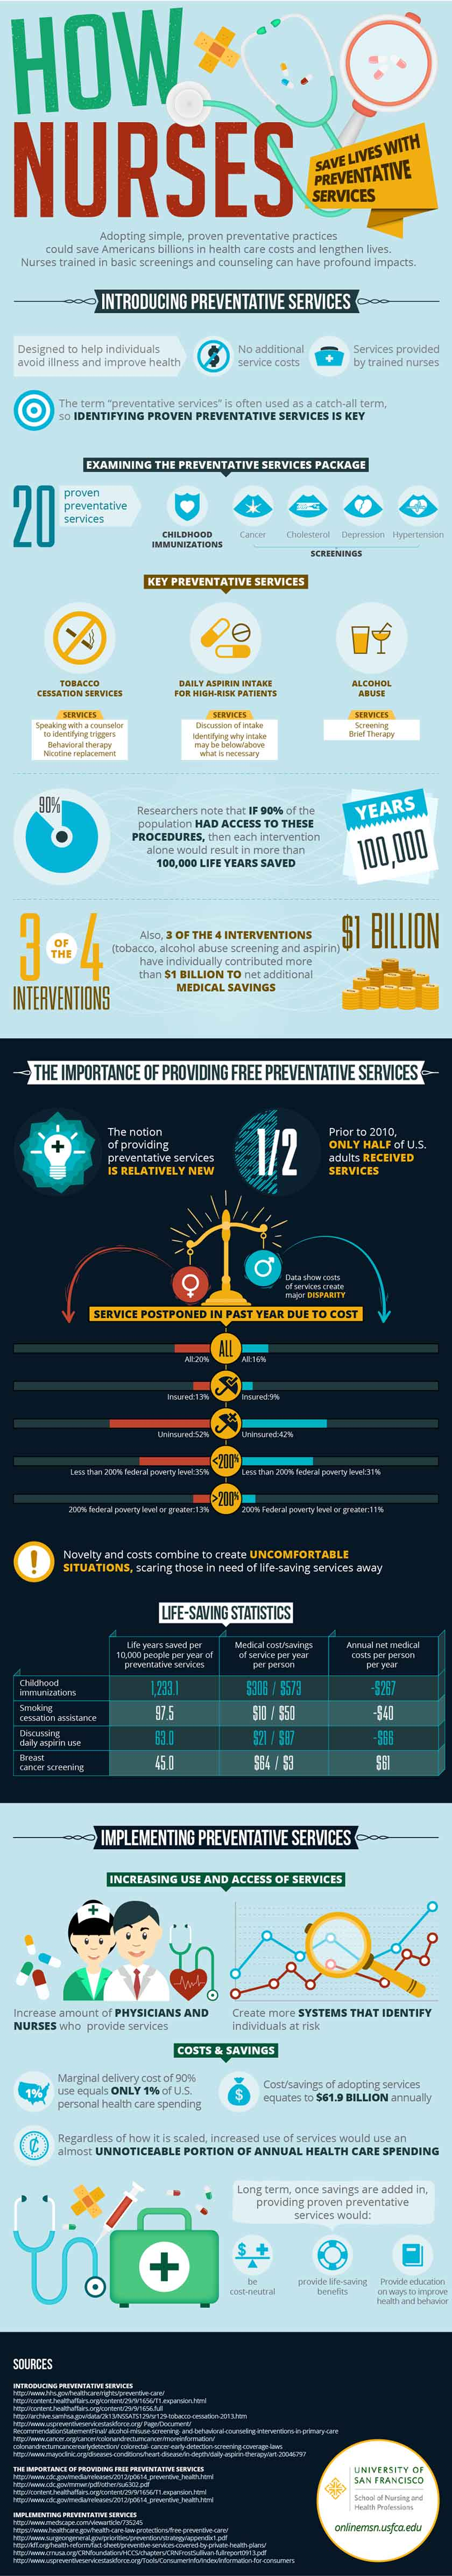 How Nurses save Lives with PreventativeServices